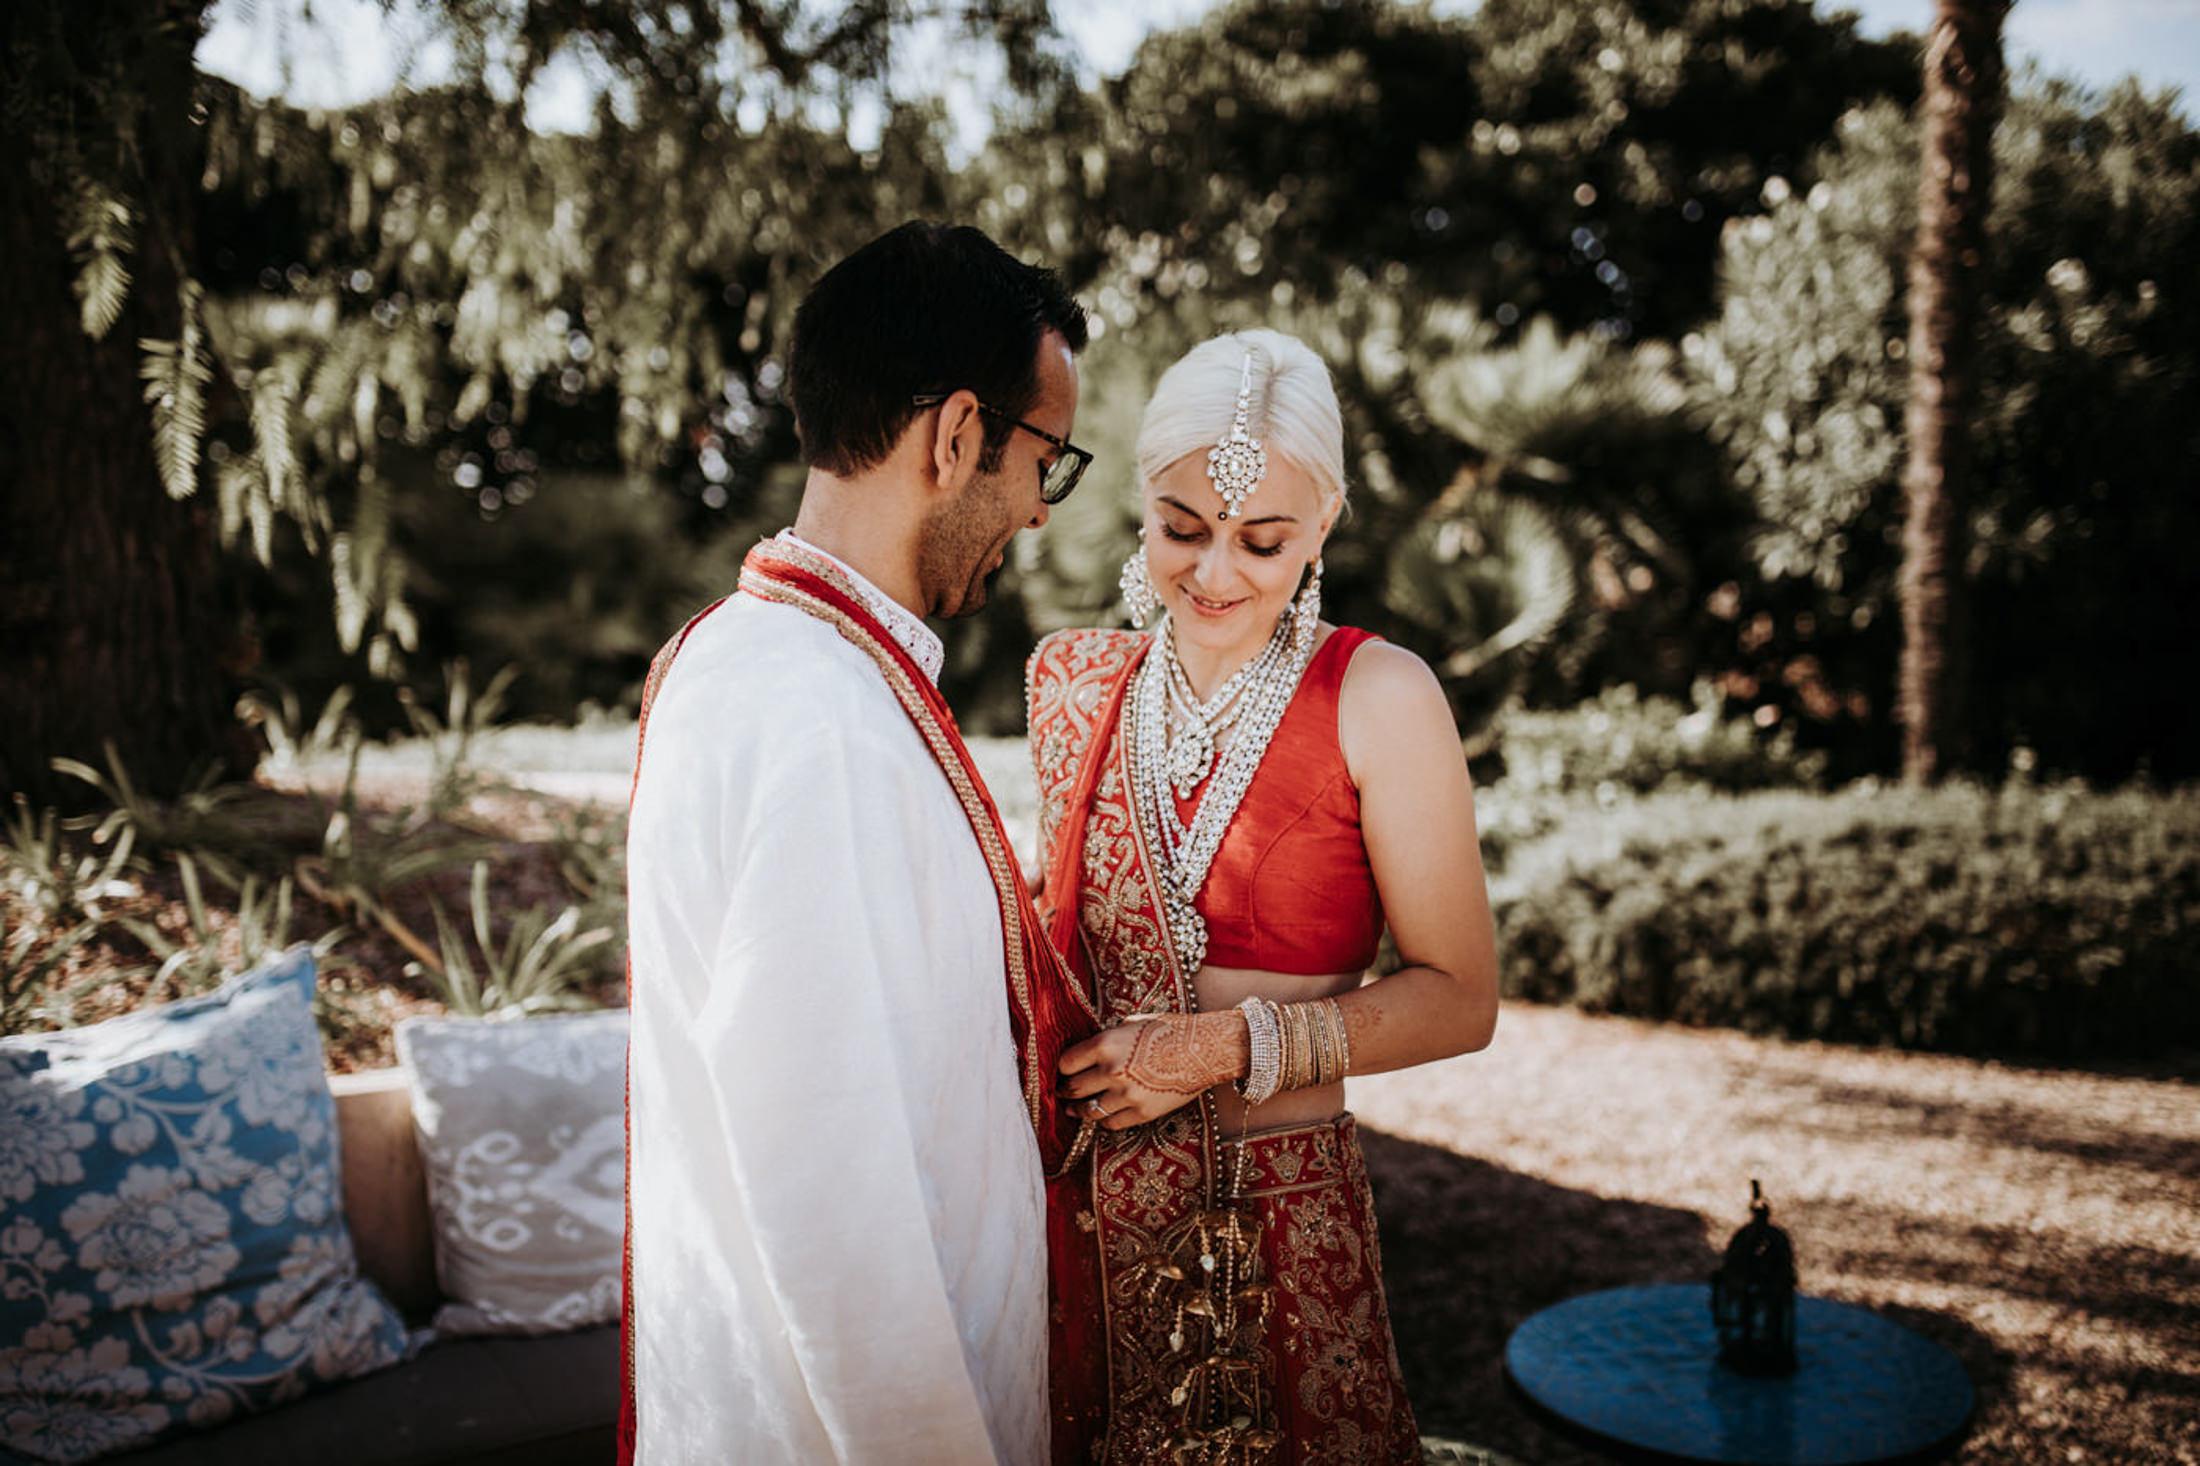 Wedding_Photographer_Mallorca_Daniela-Marquardt_Photography_New_York_Iceland_Tuscany_Santorini_Portugal_Austria_Bavaria_Elopement_Hochzeitsfotograf_AntjeRajat2_60